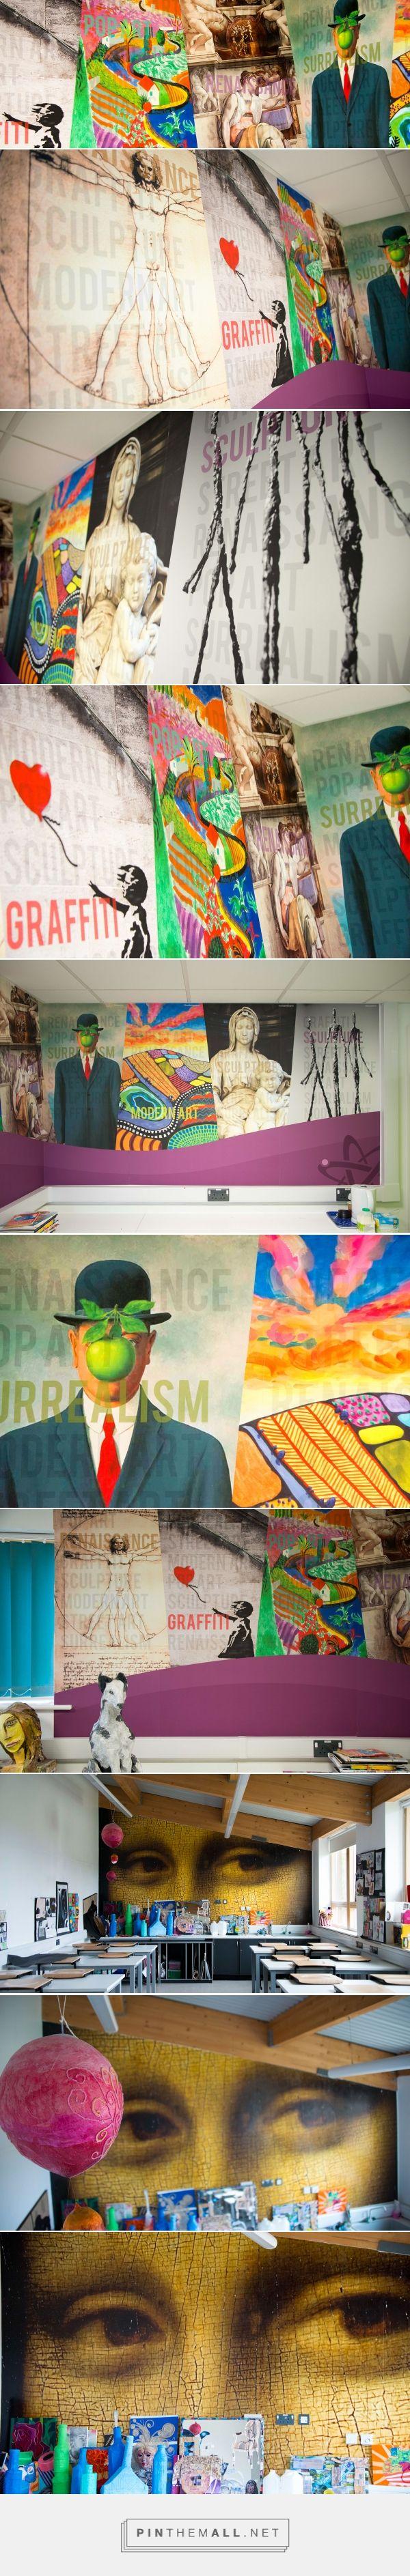 Sixth Form Studio - Art Classroom on Behance